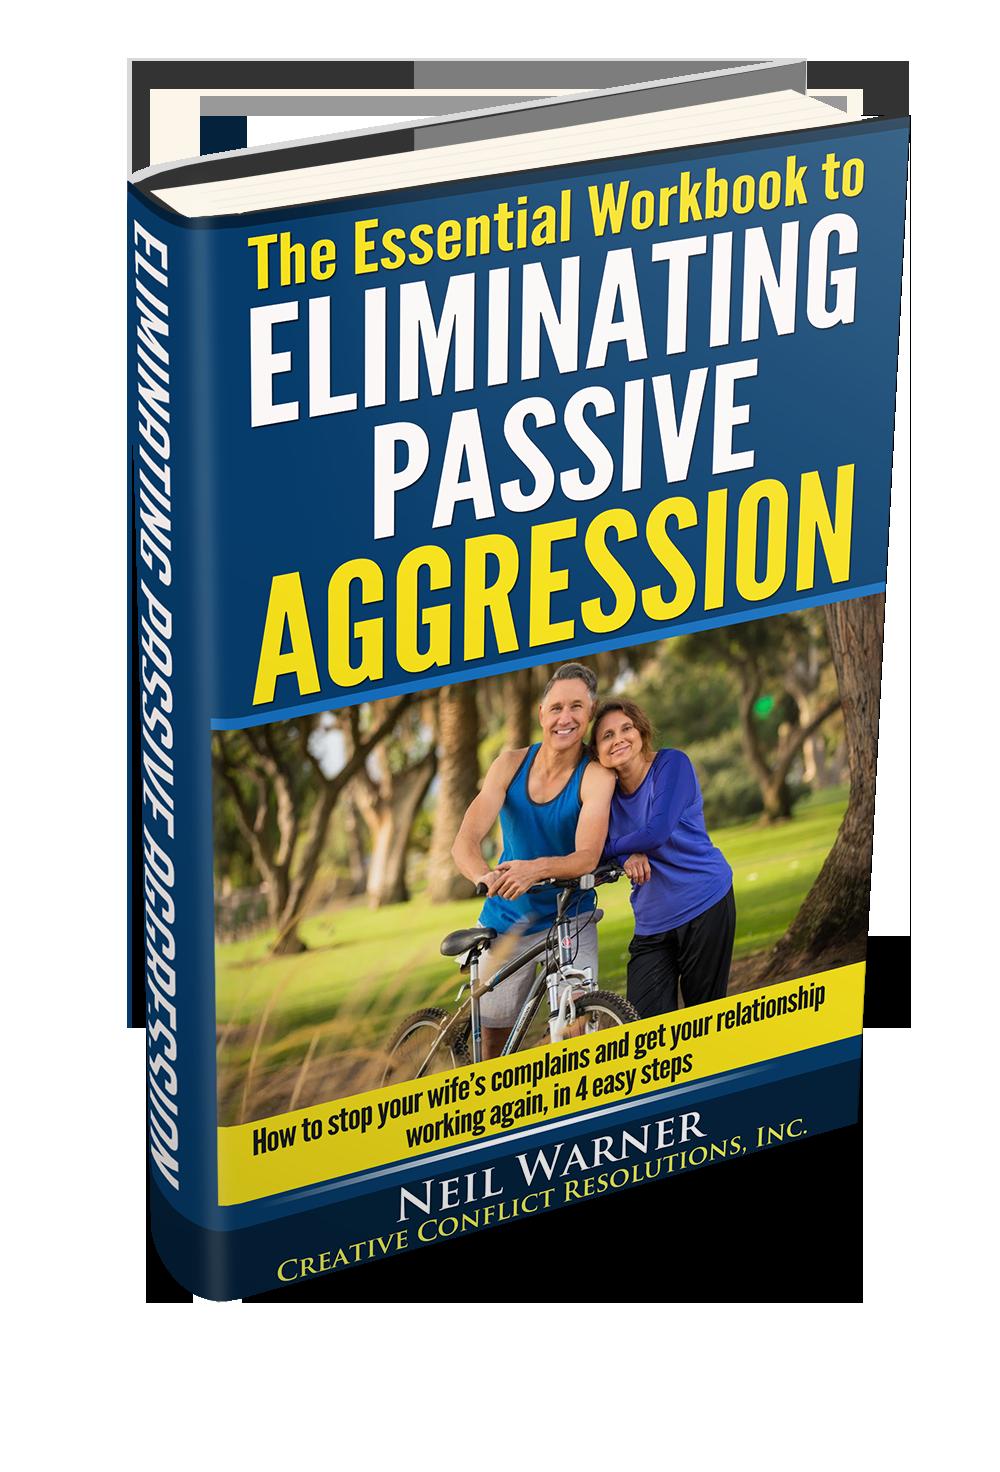 How to cure passive aggressive behavior